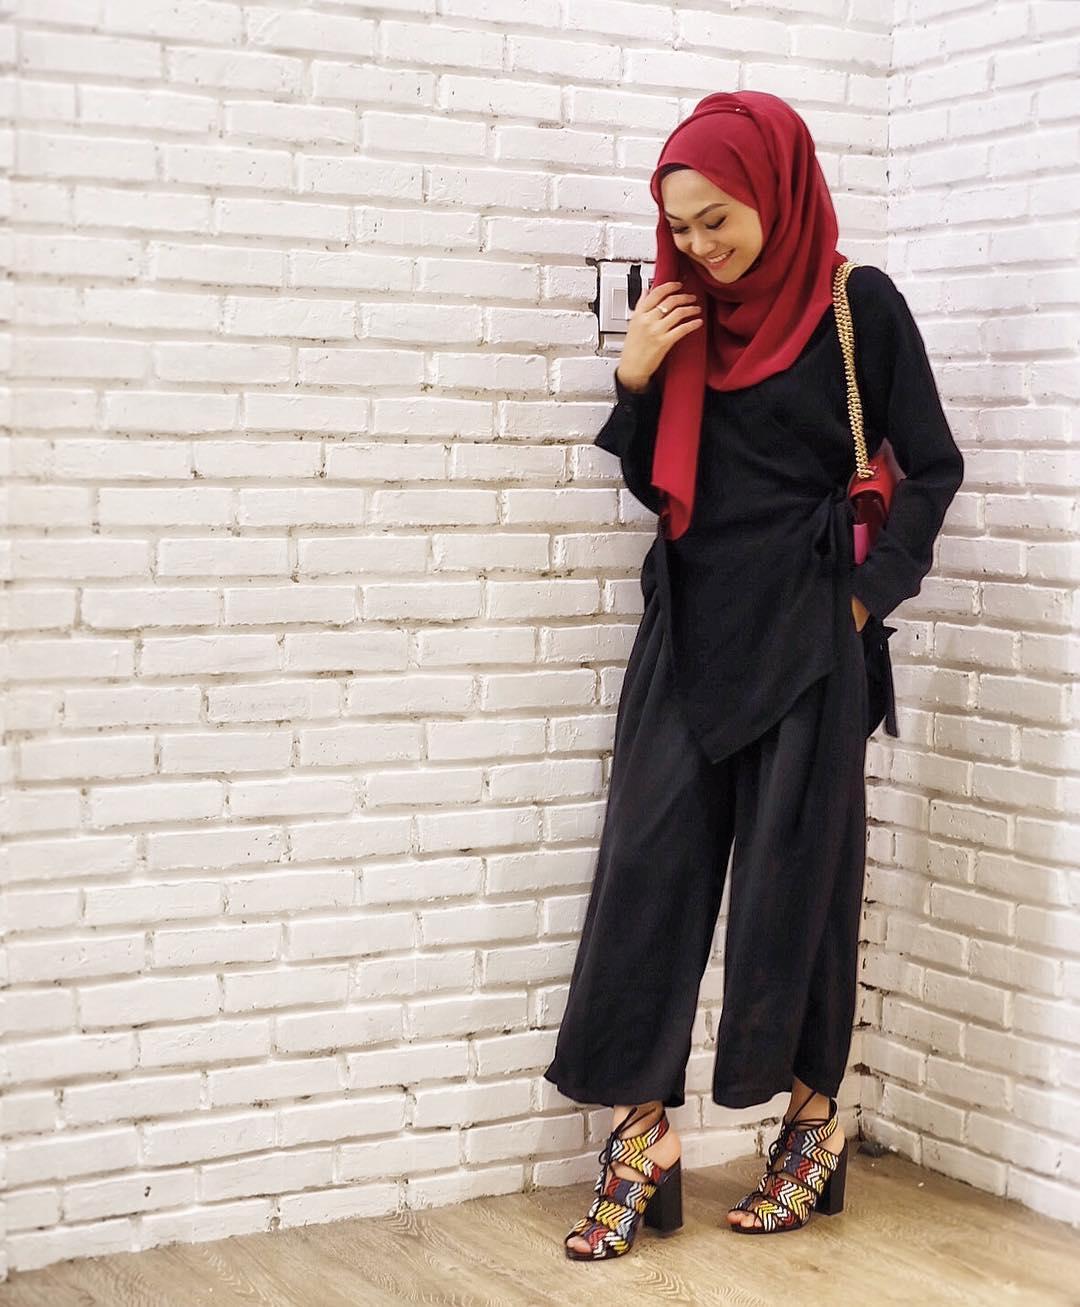 50 Model Celana Kulot Remaja Modis 2018 Terbaru9 Info